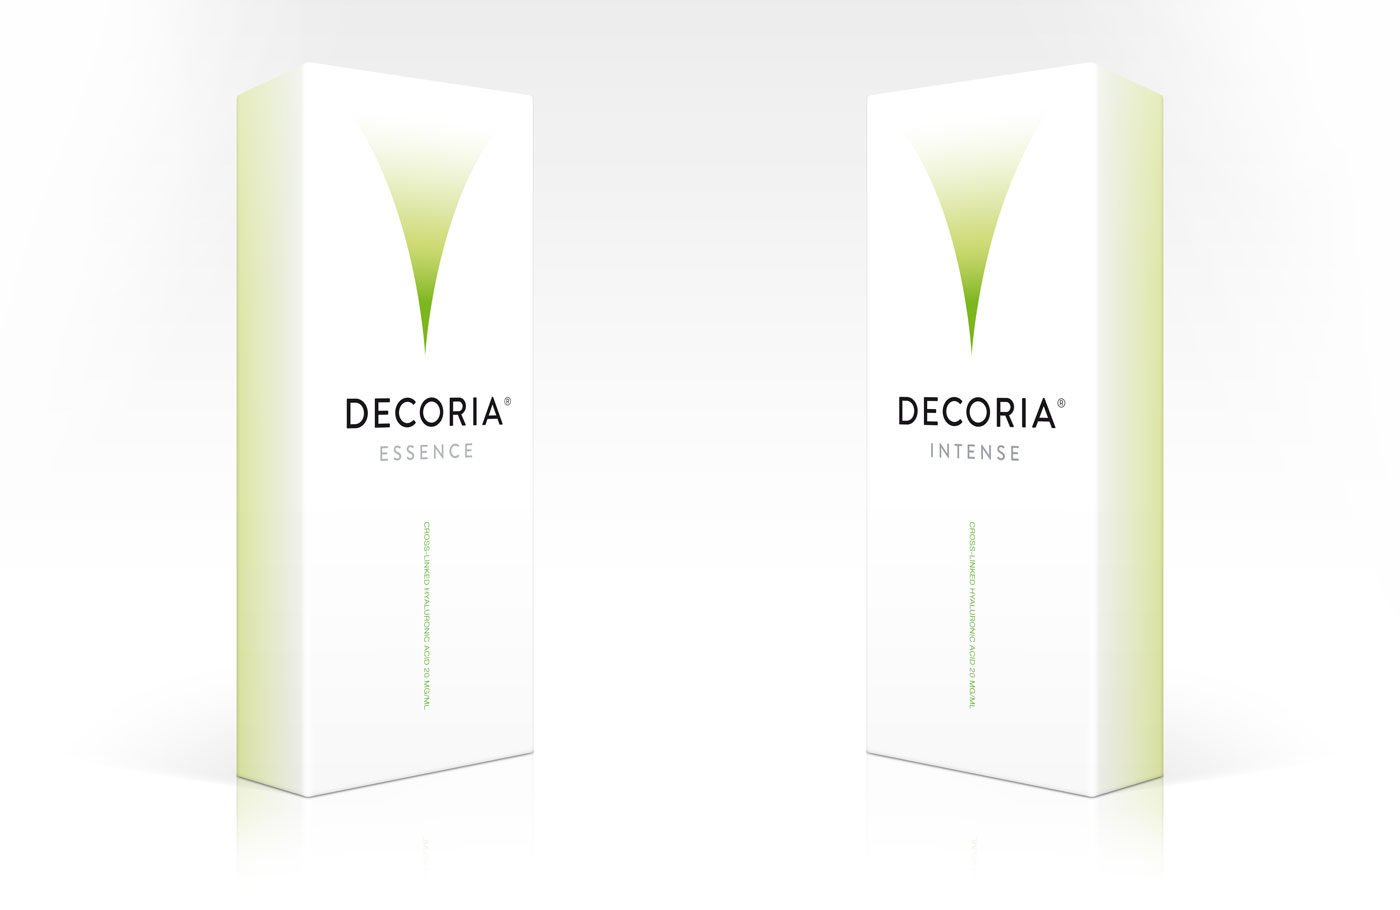 Products Decoria Essence Decoria Intense